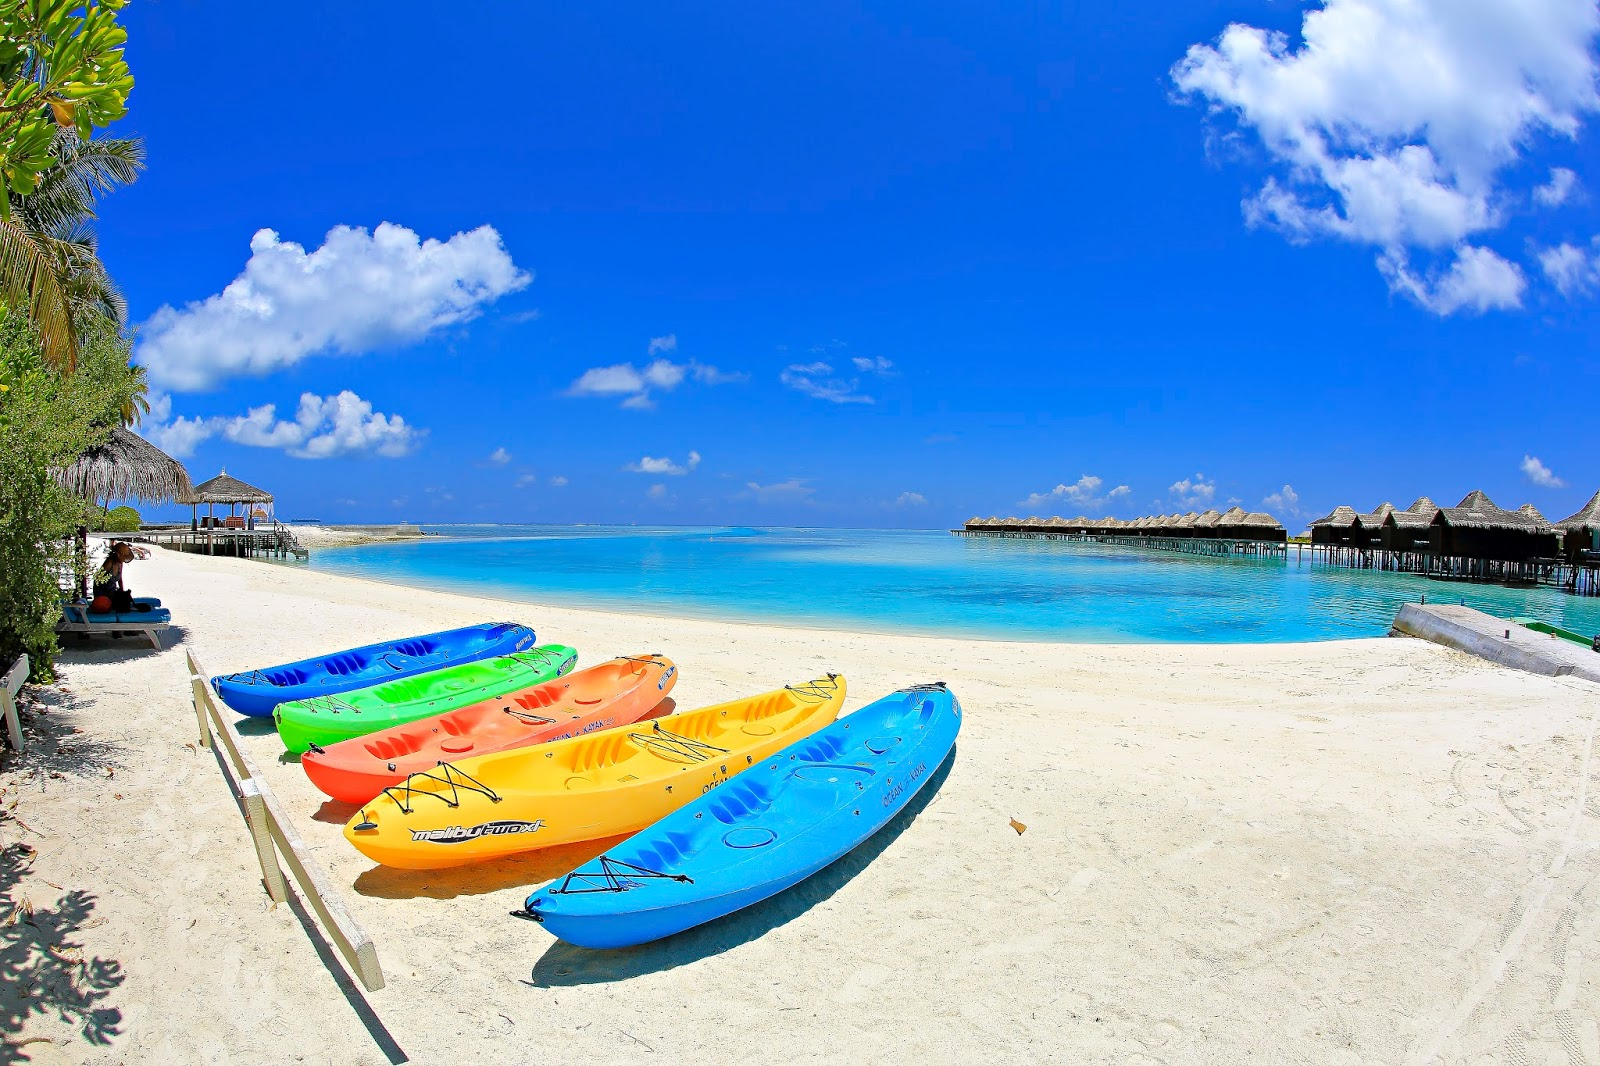 10 Best Caribbean Beach Pictures Wallpaper Full Hd 1920: BANCO DE IMÁGENES GRATIS: Paisajes Naturales (Playas